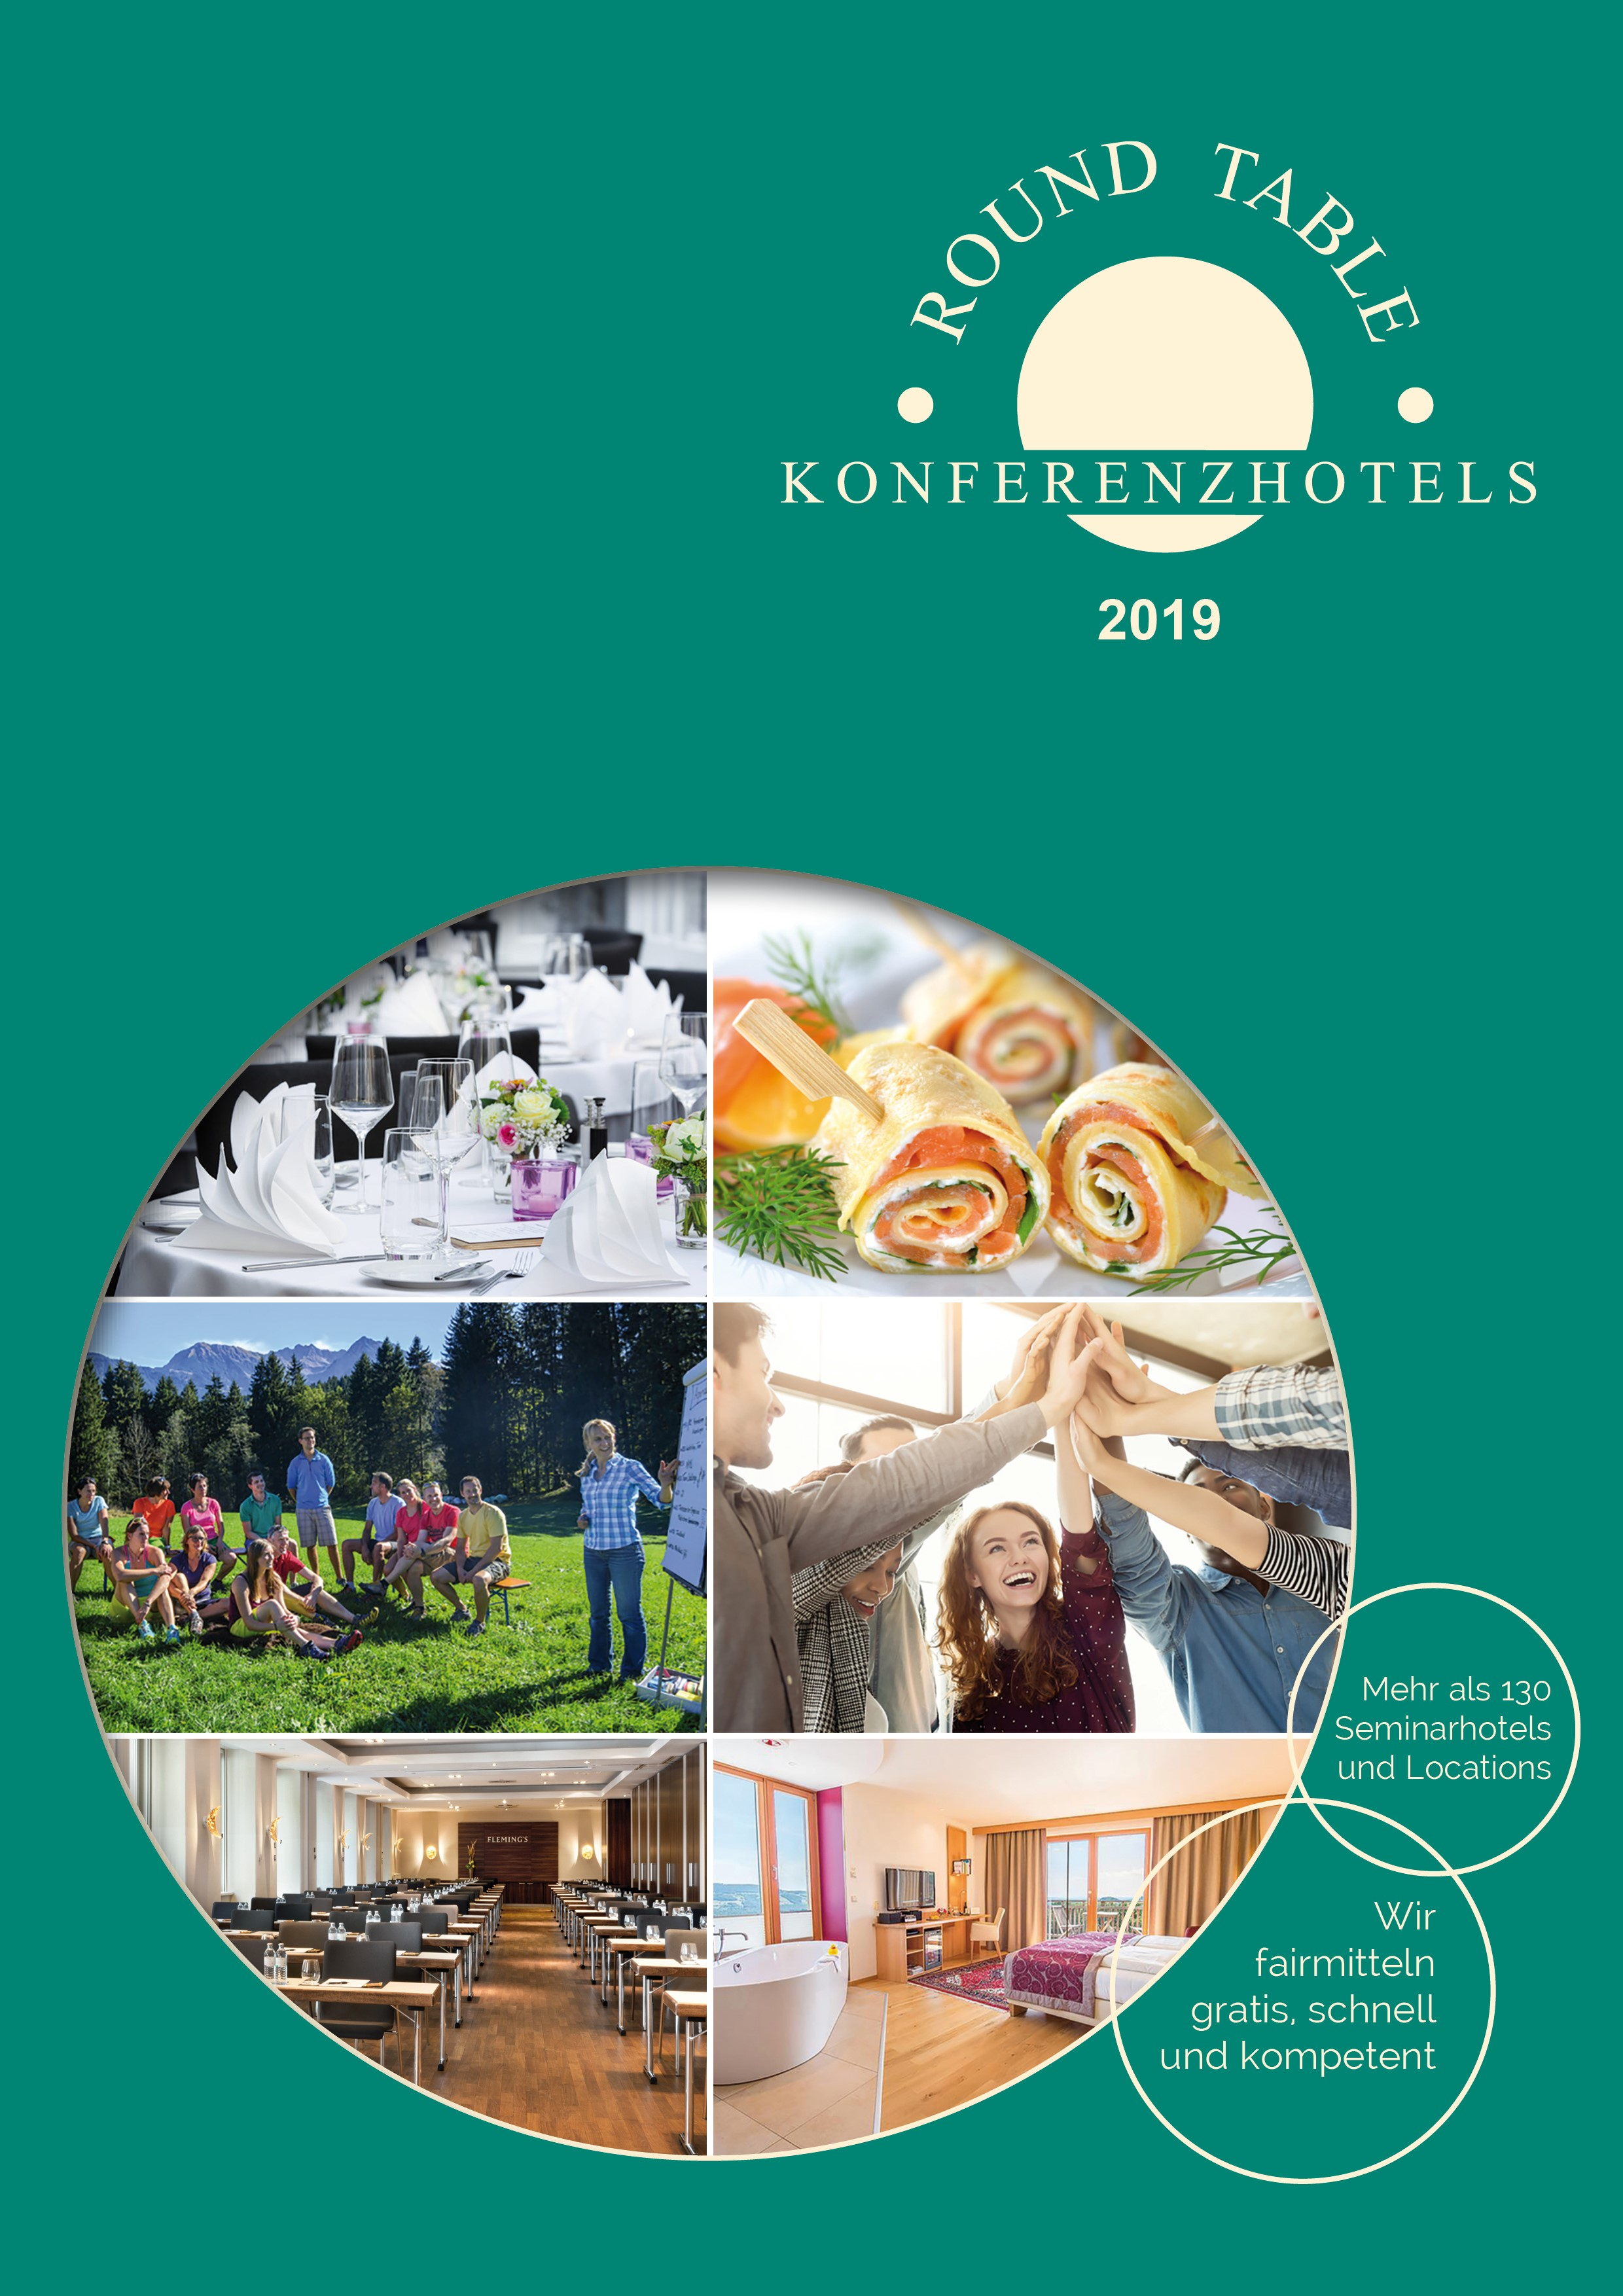 Katalogcover 2019